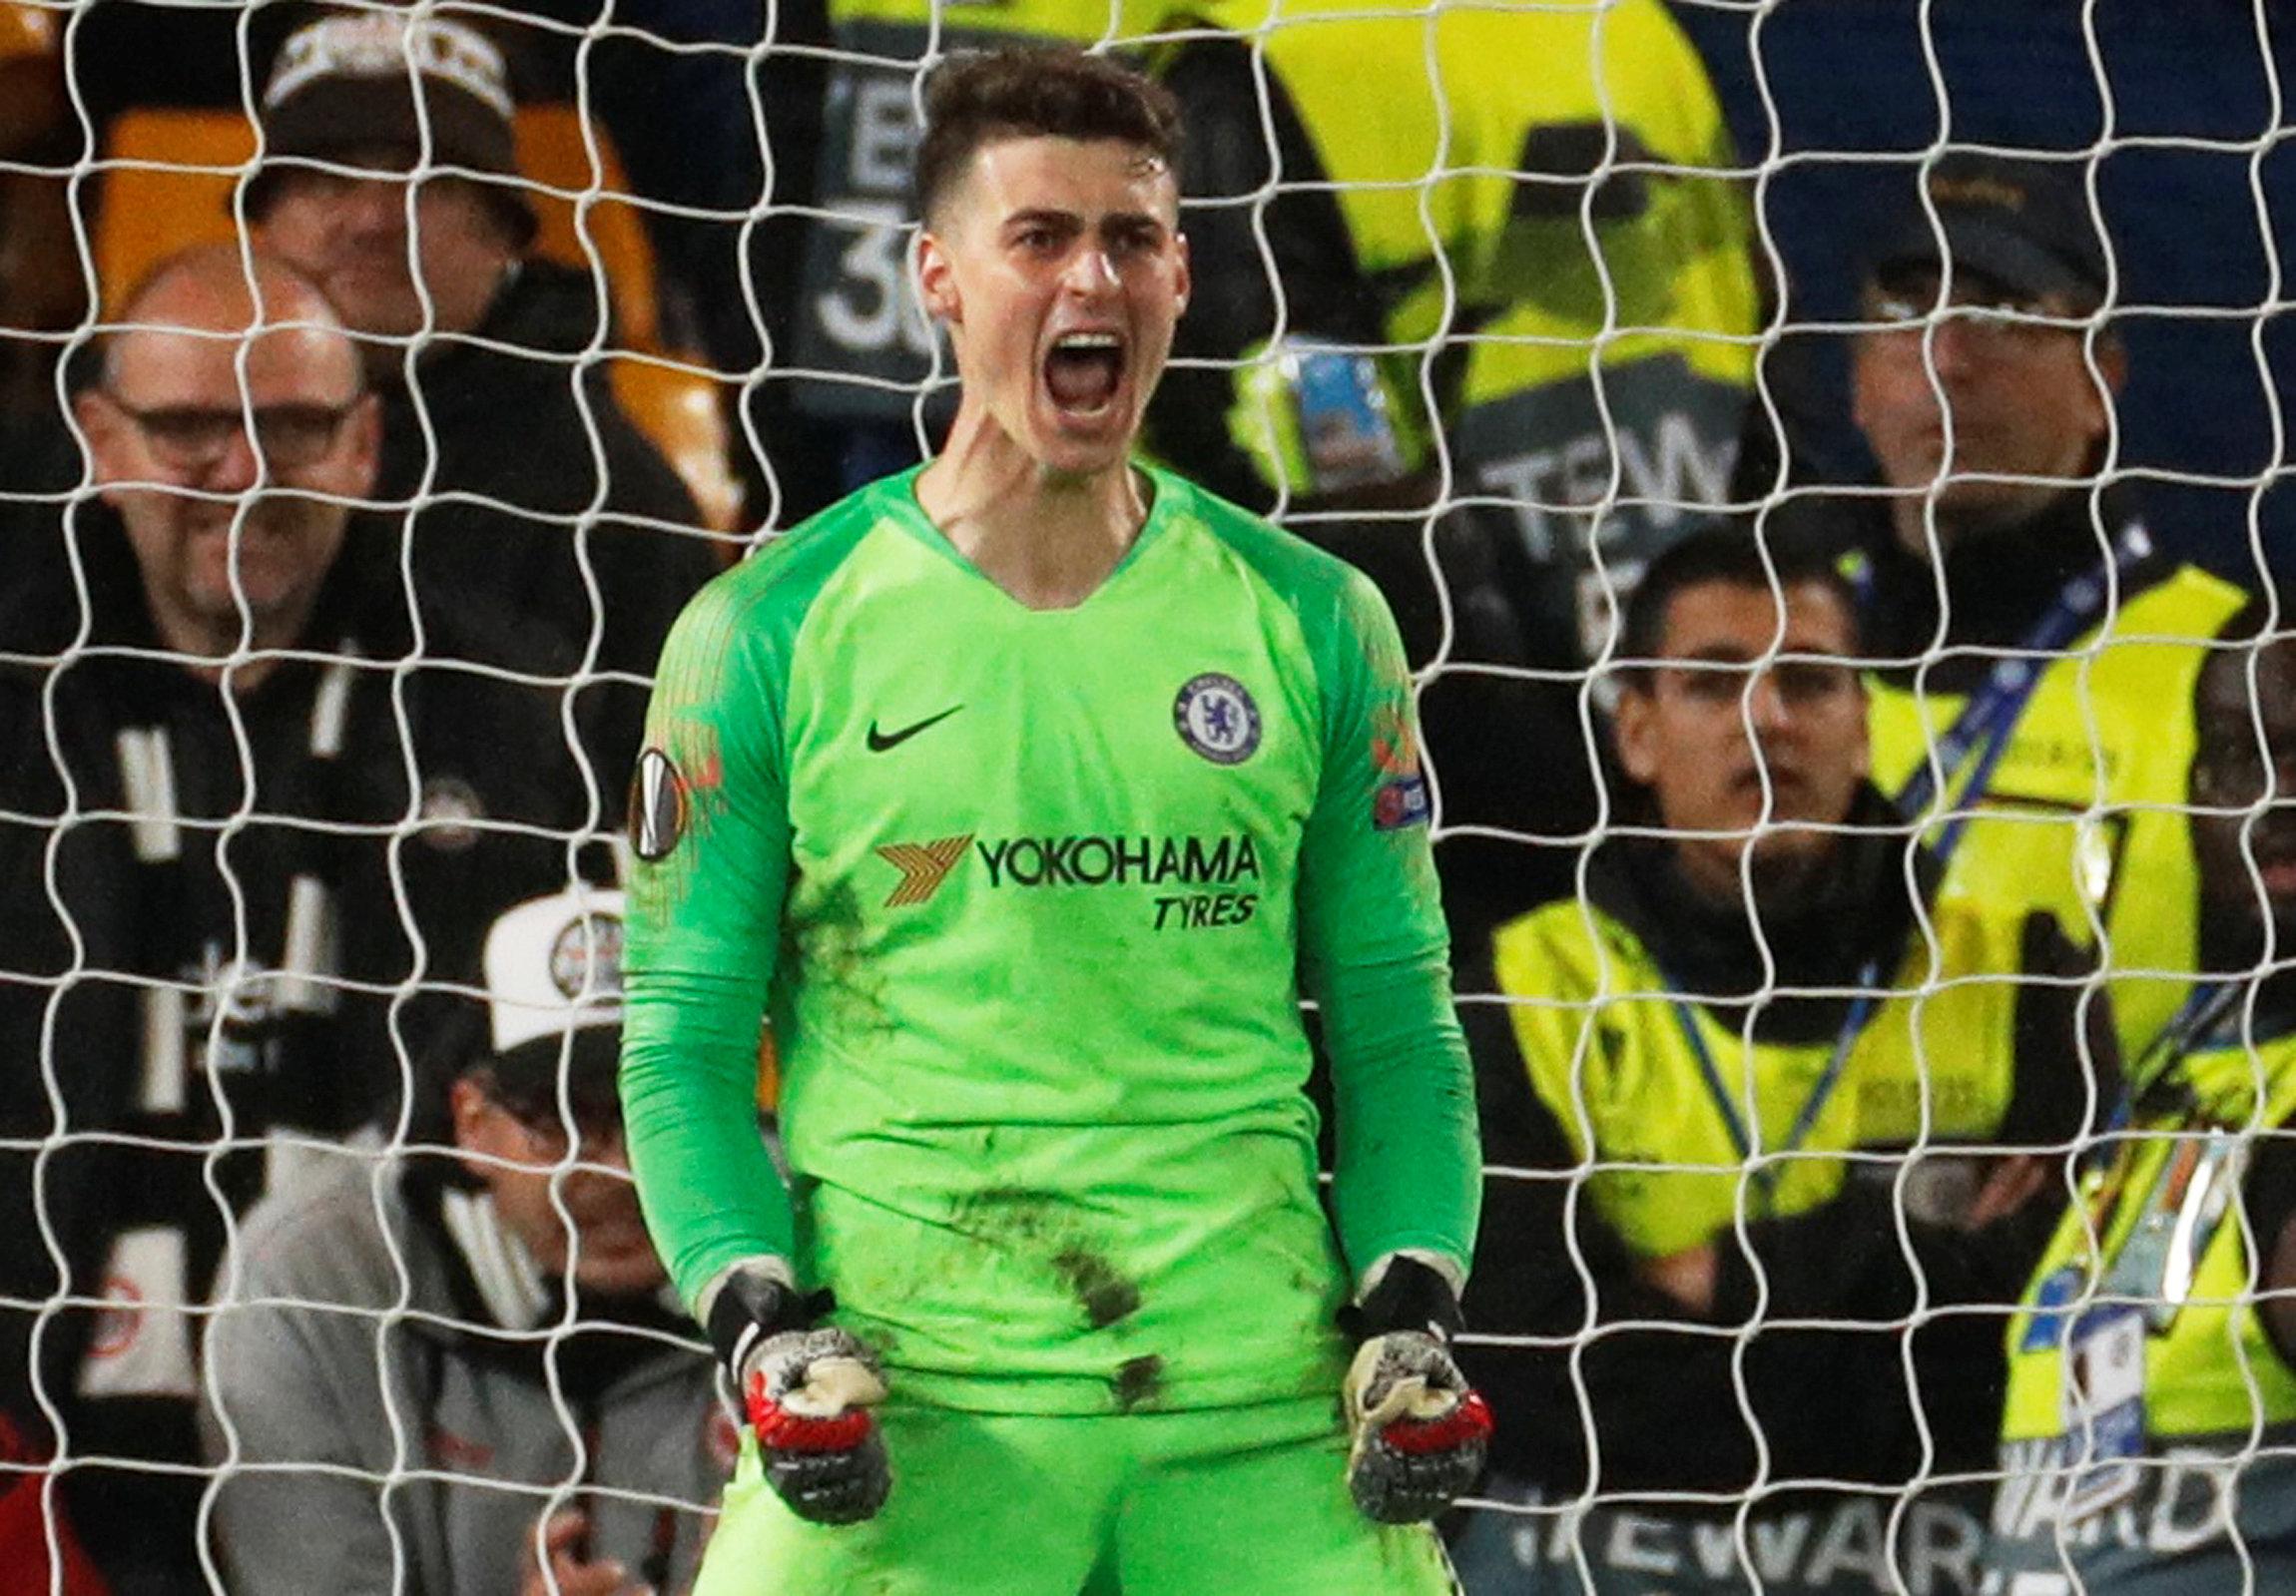 En fotos: Chelsea selló la Final inglesa en Europa League al ganar en penaltis la Semifinal